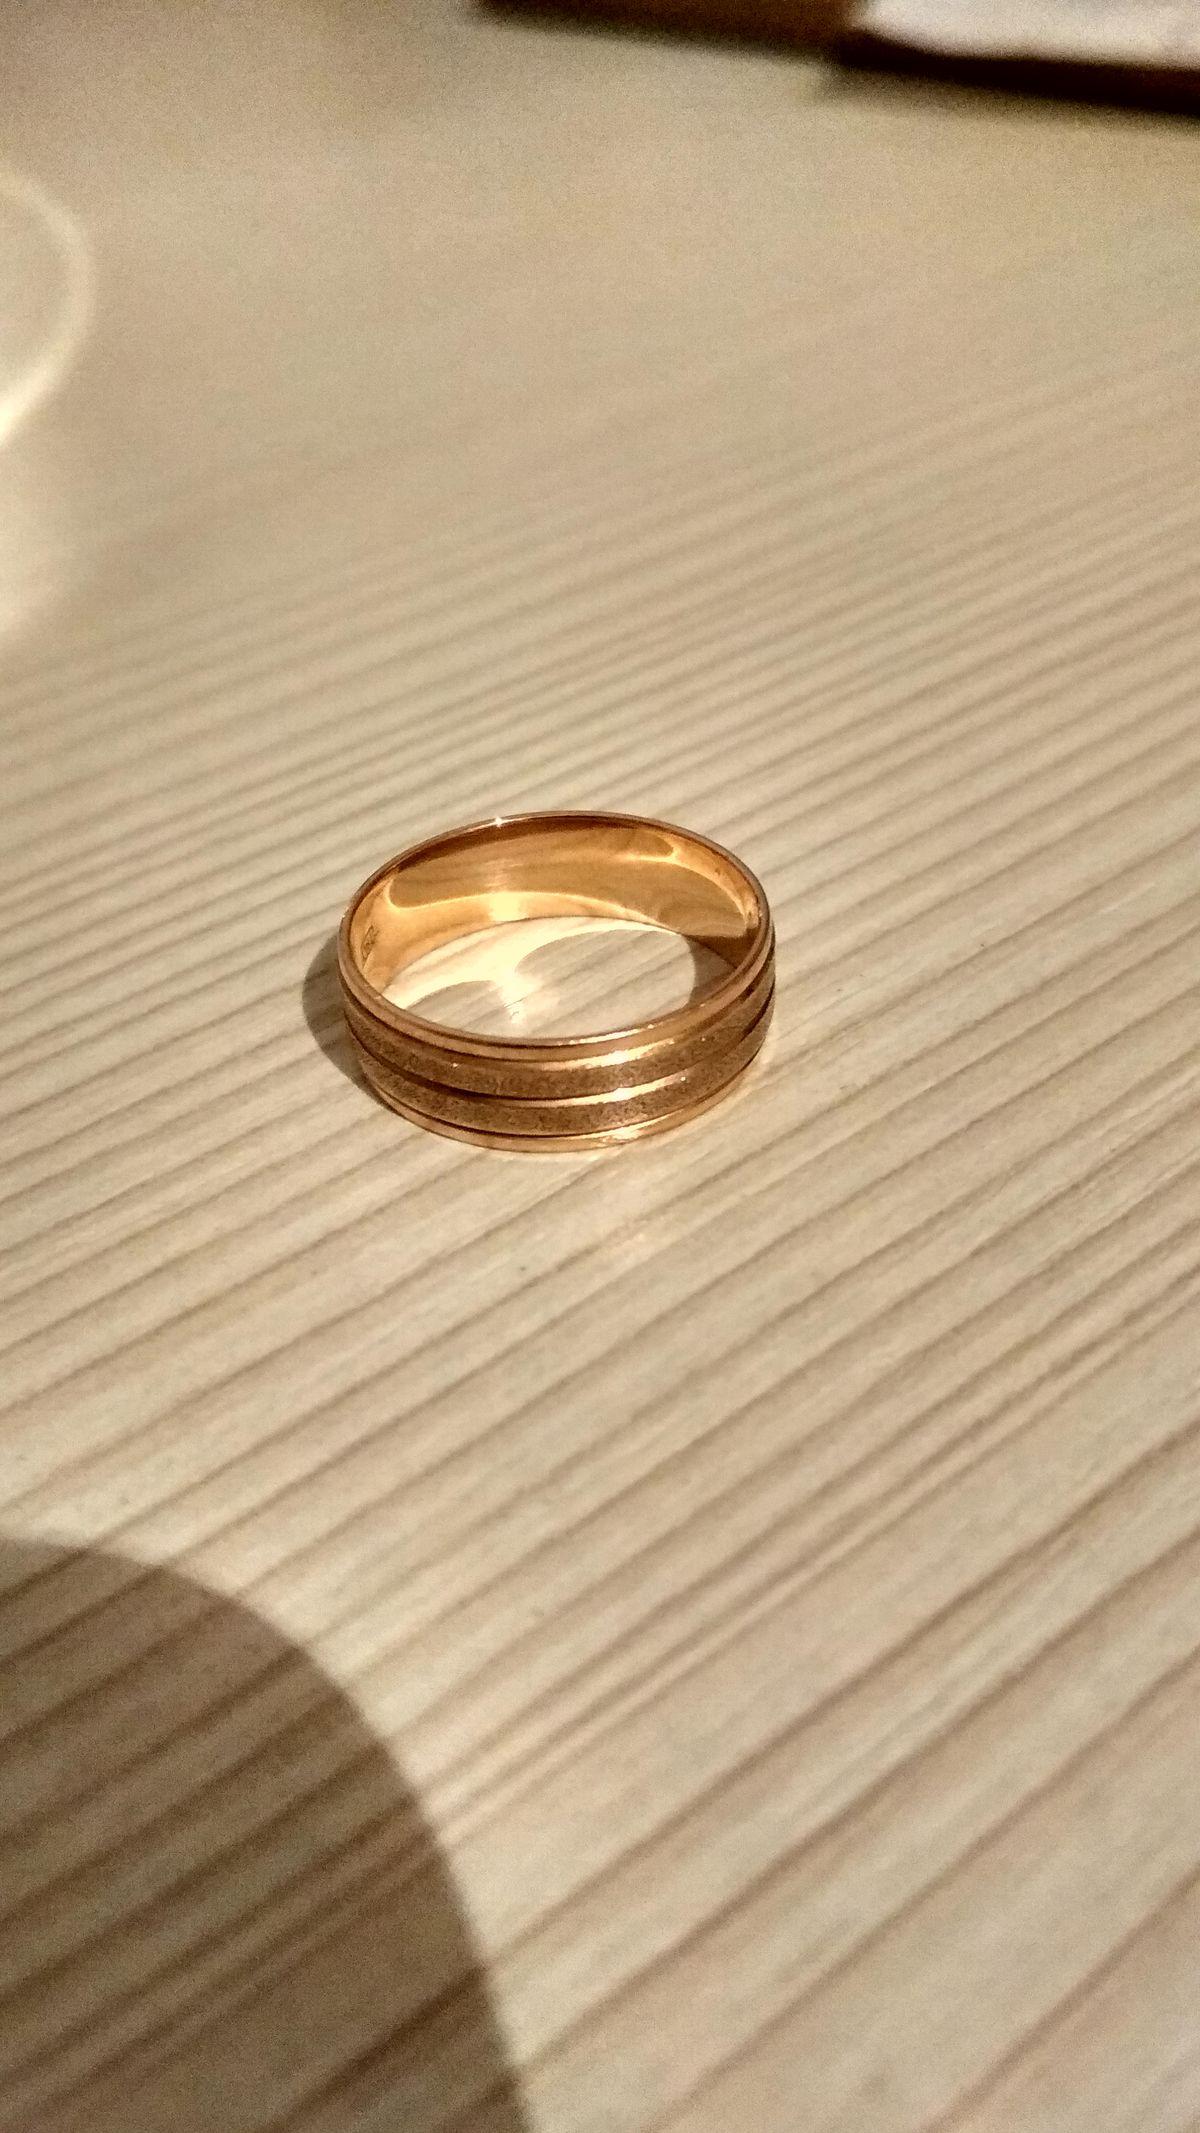 Кольцо моей мечты